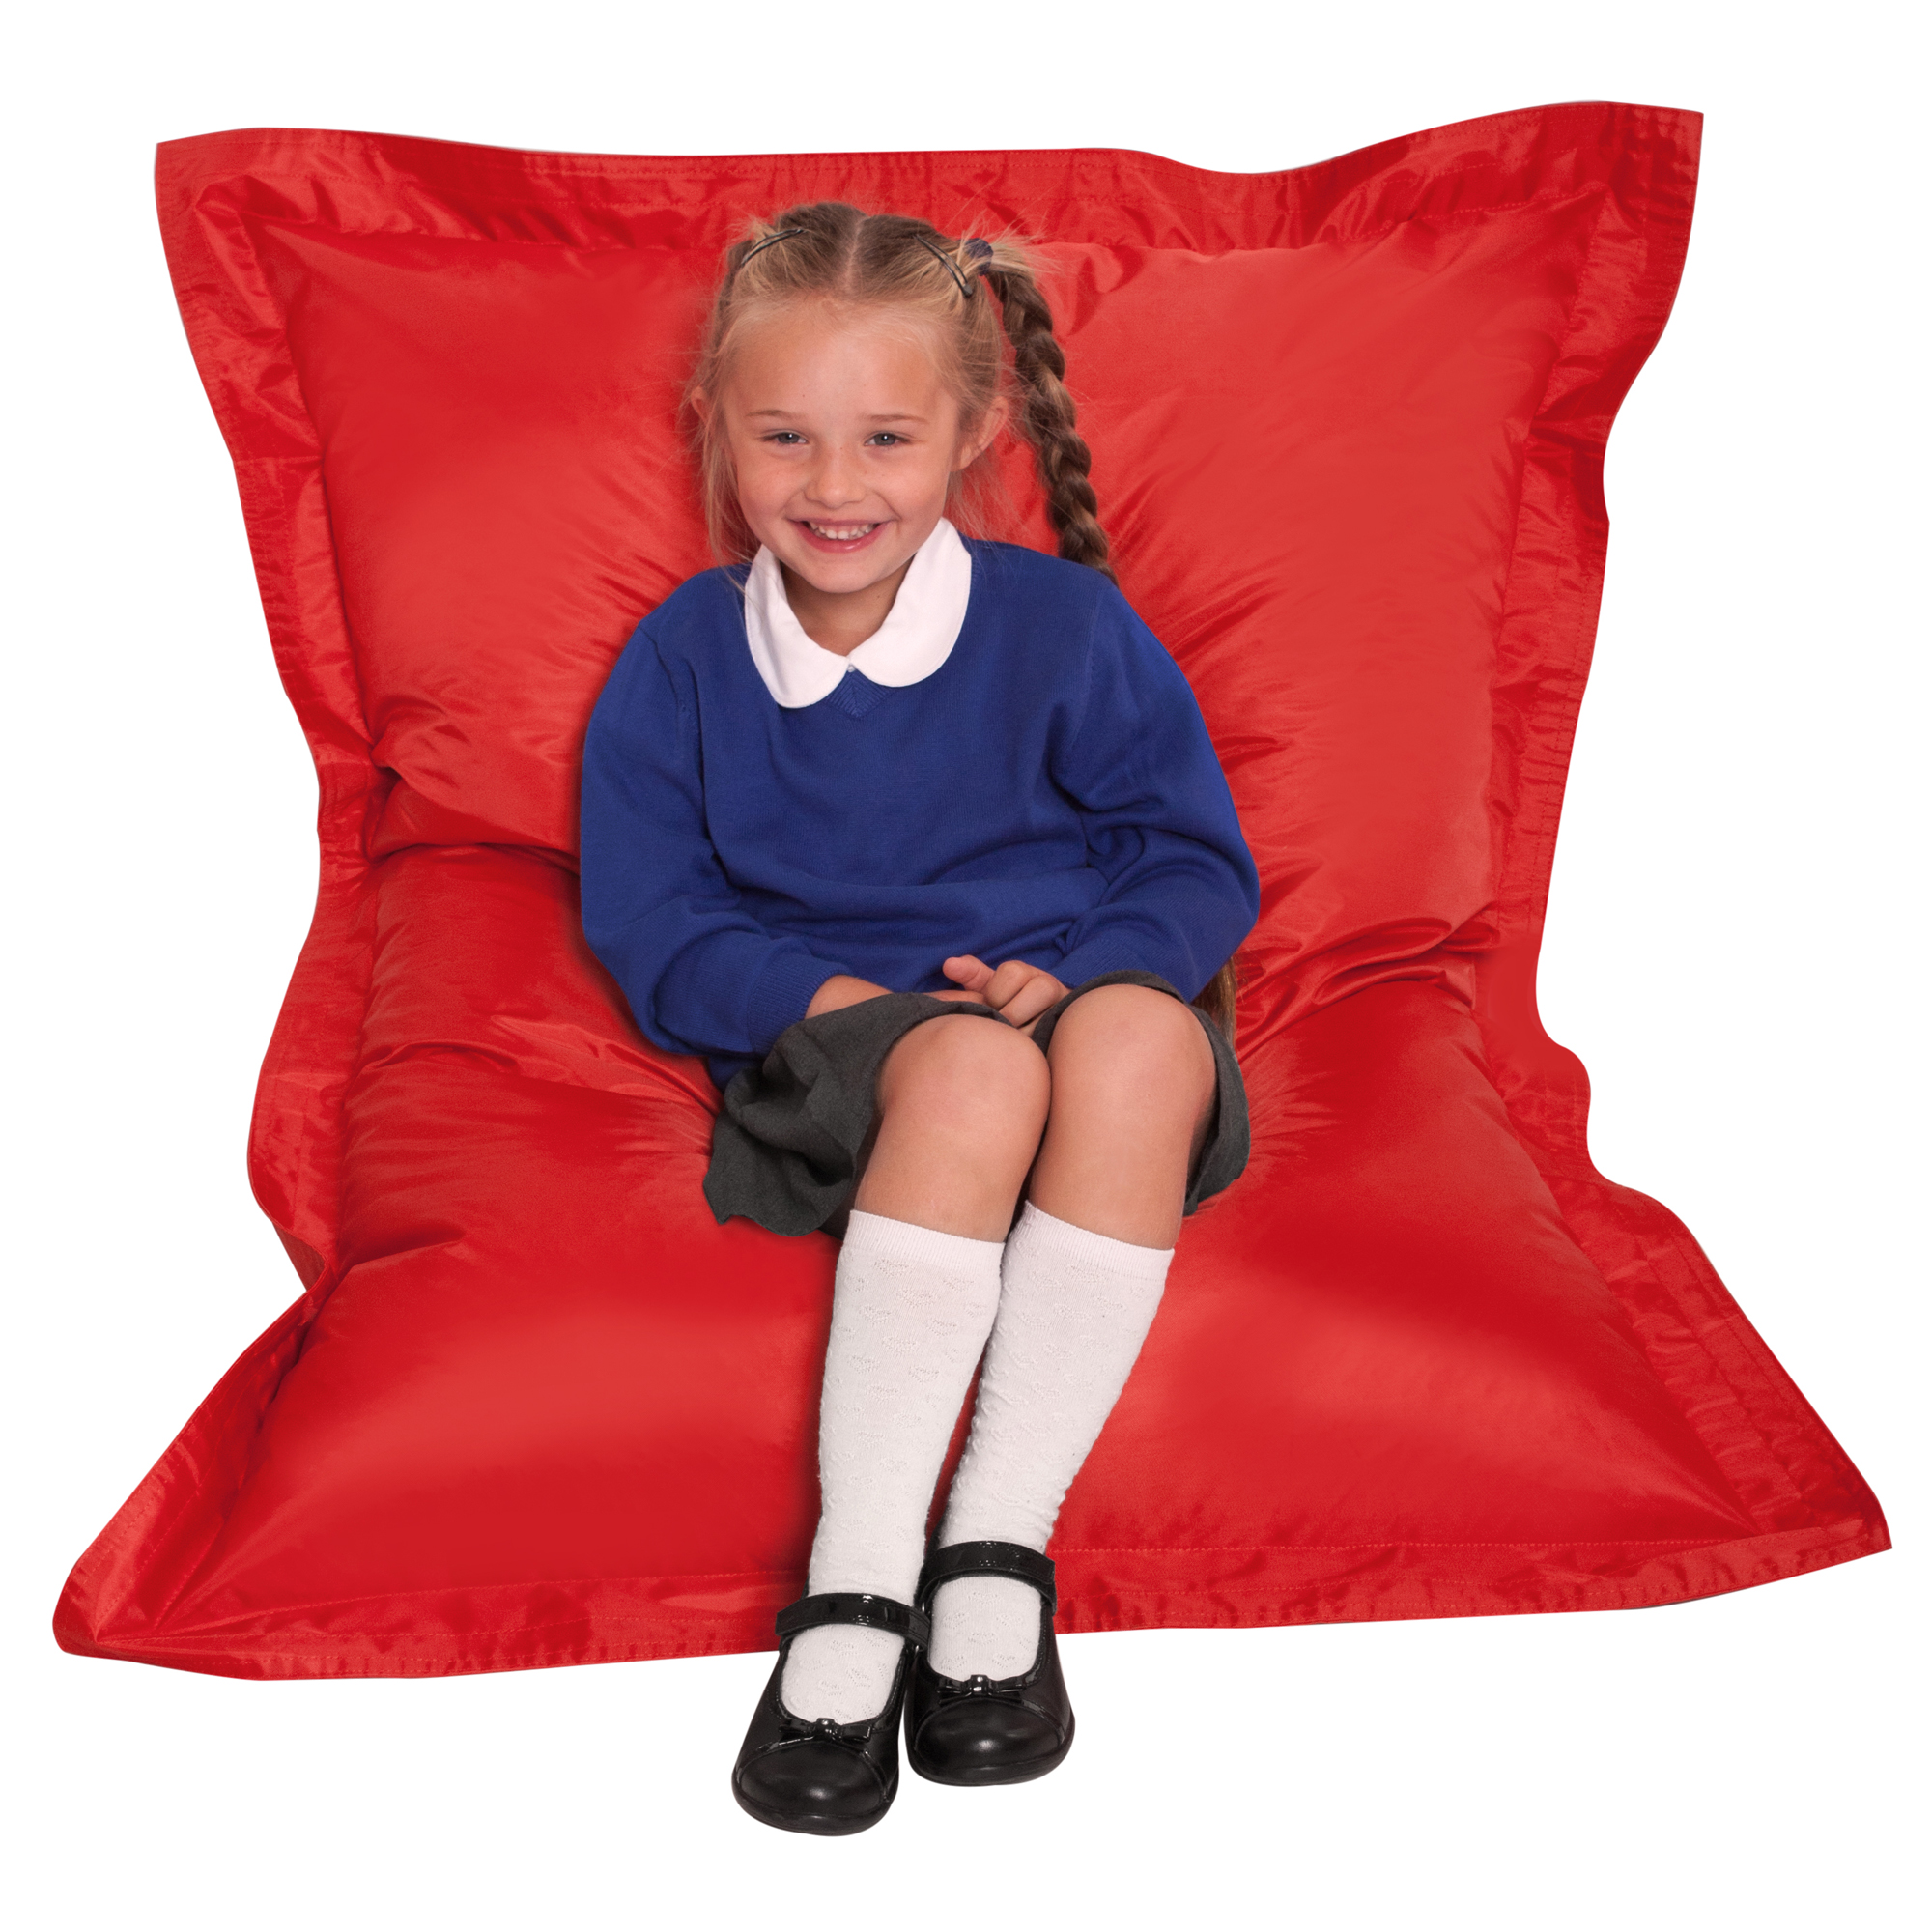 Eden-Childrens-Giant-Cushion-red-300dpi-5